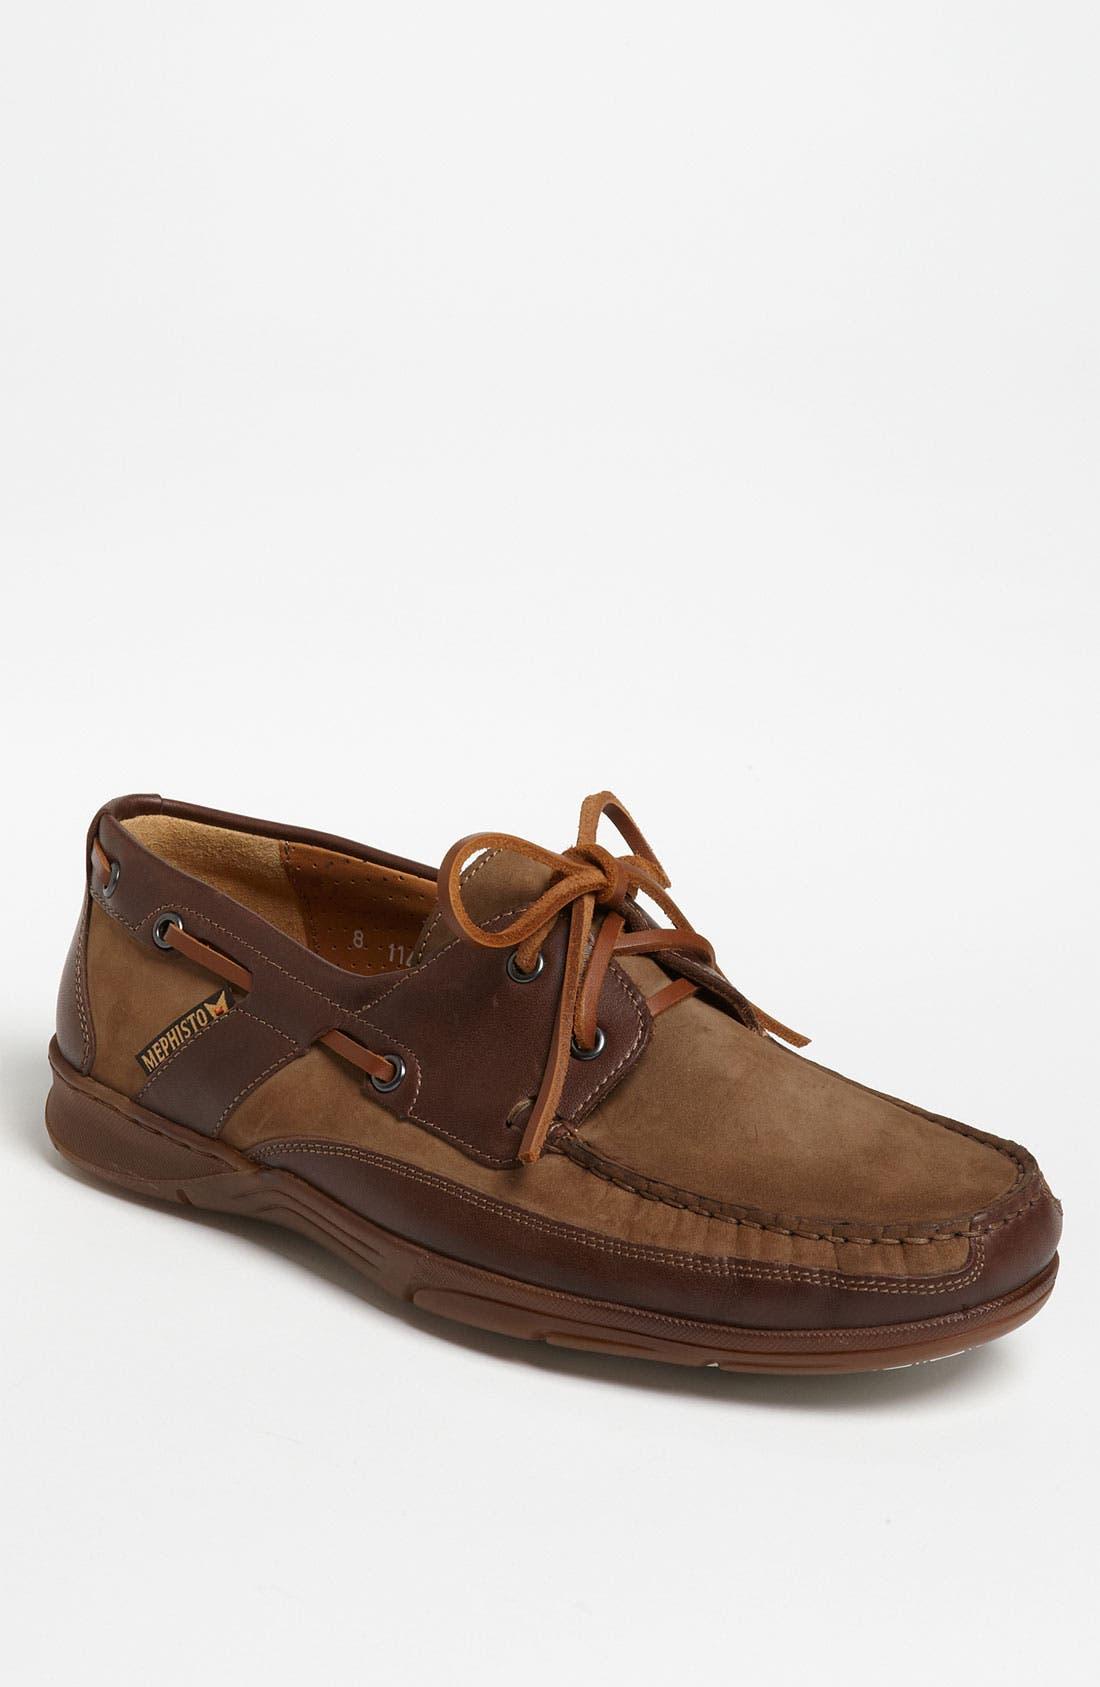 Alternate Image 1 Selected - Mephisto 'Felix' Boat Shoe (Men)